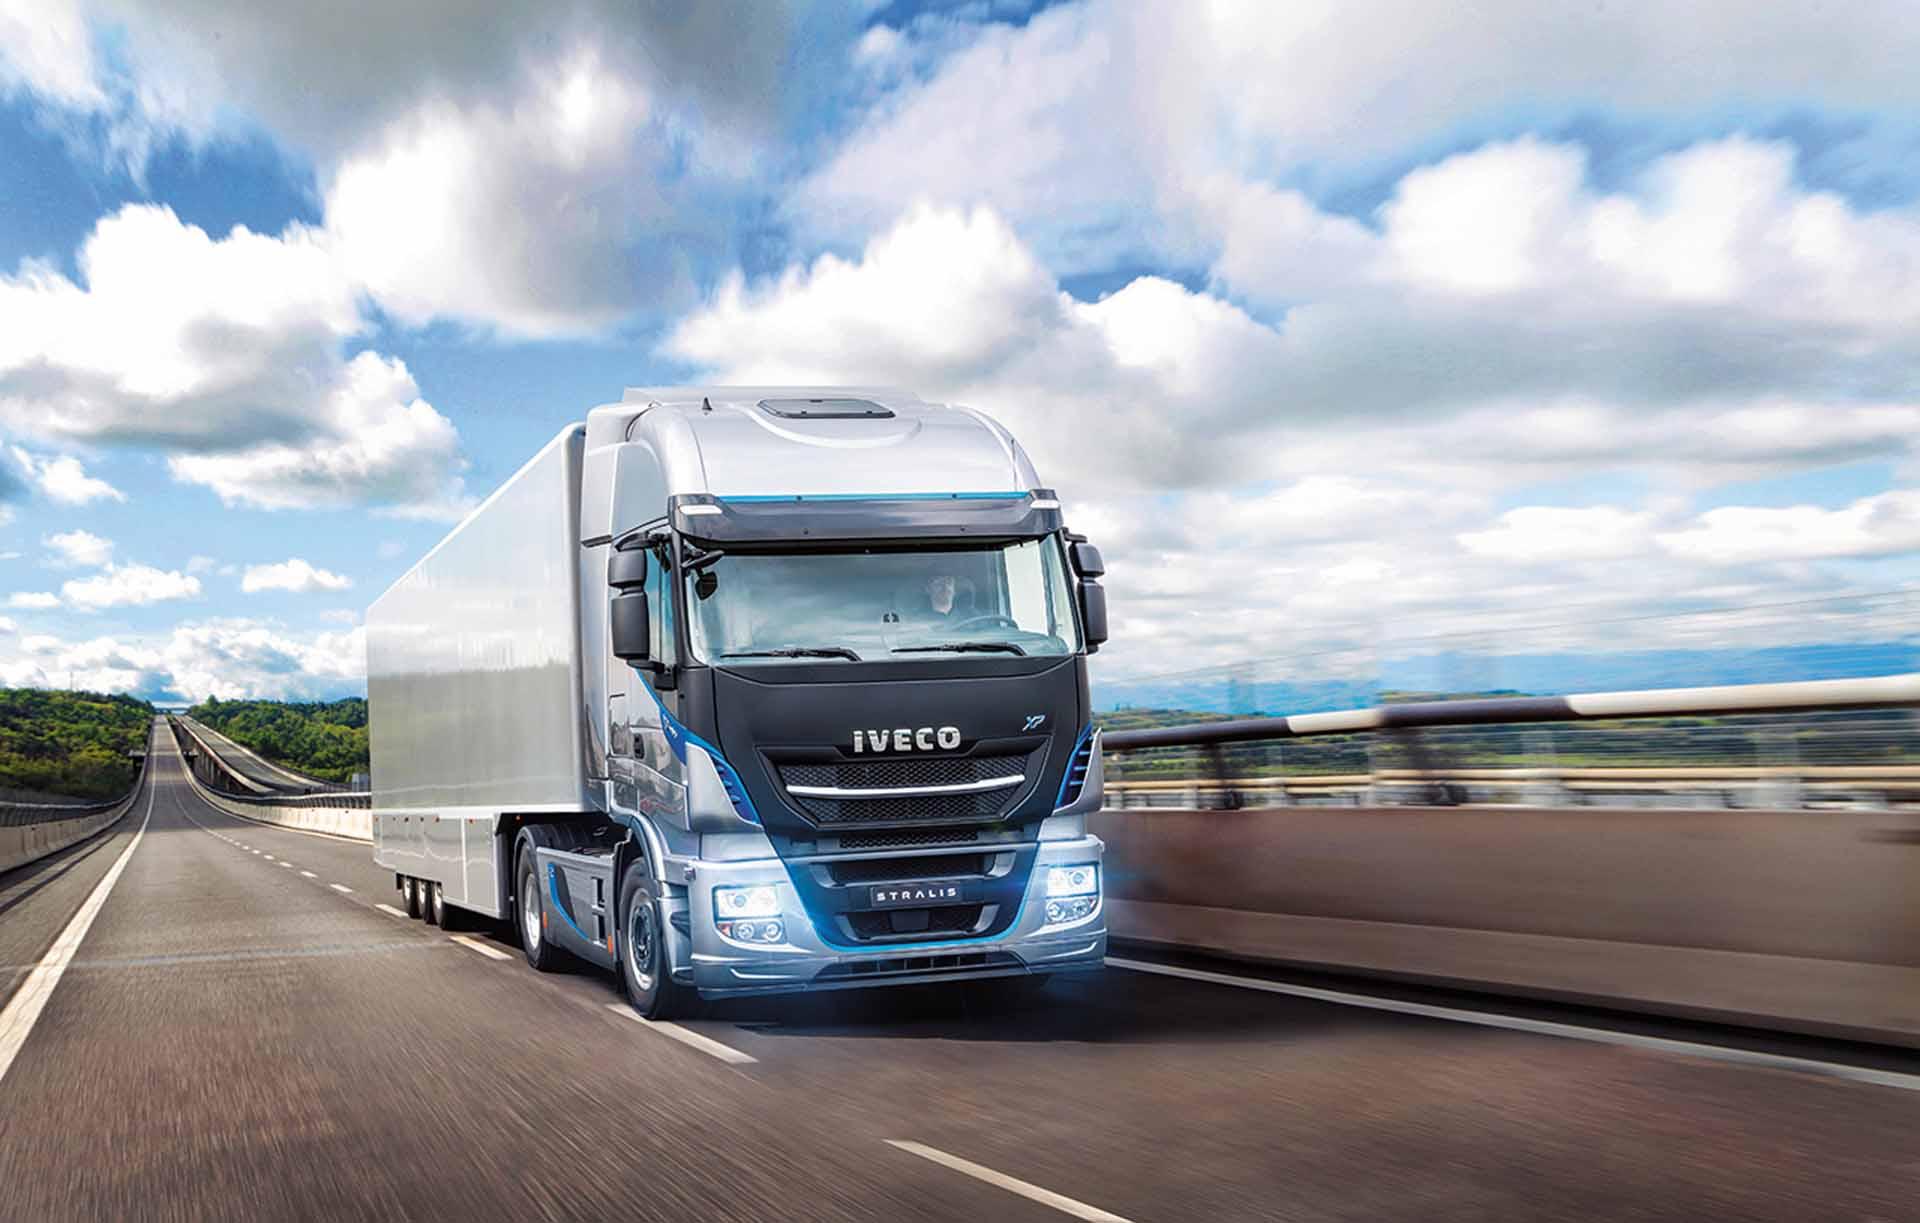 iveco-new-stralis-xp-long-haul_27852925755_o